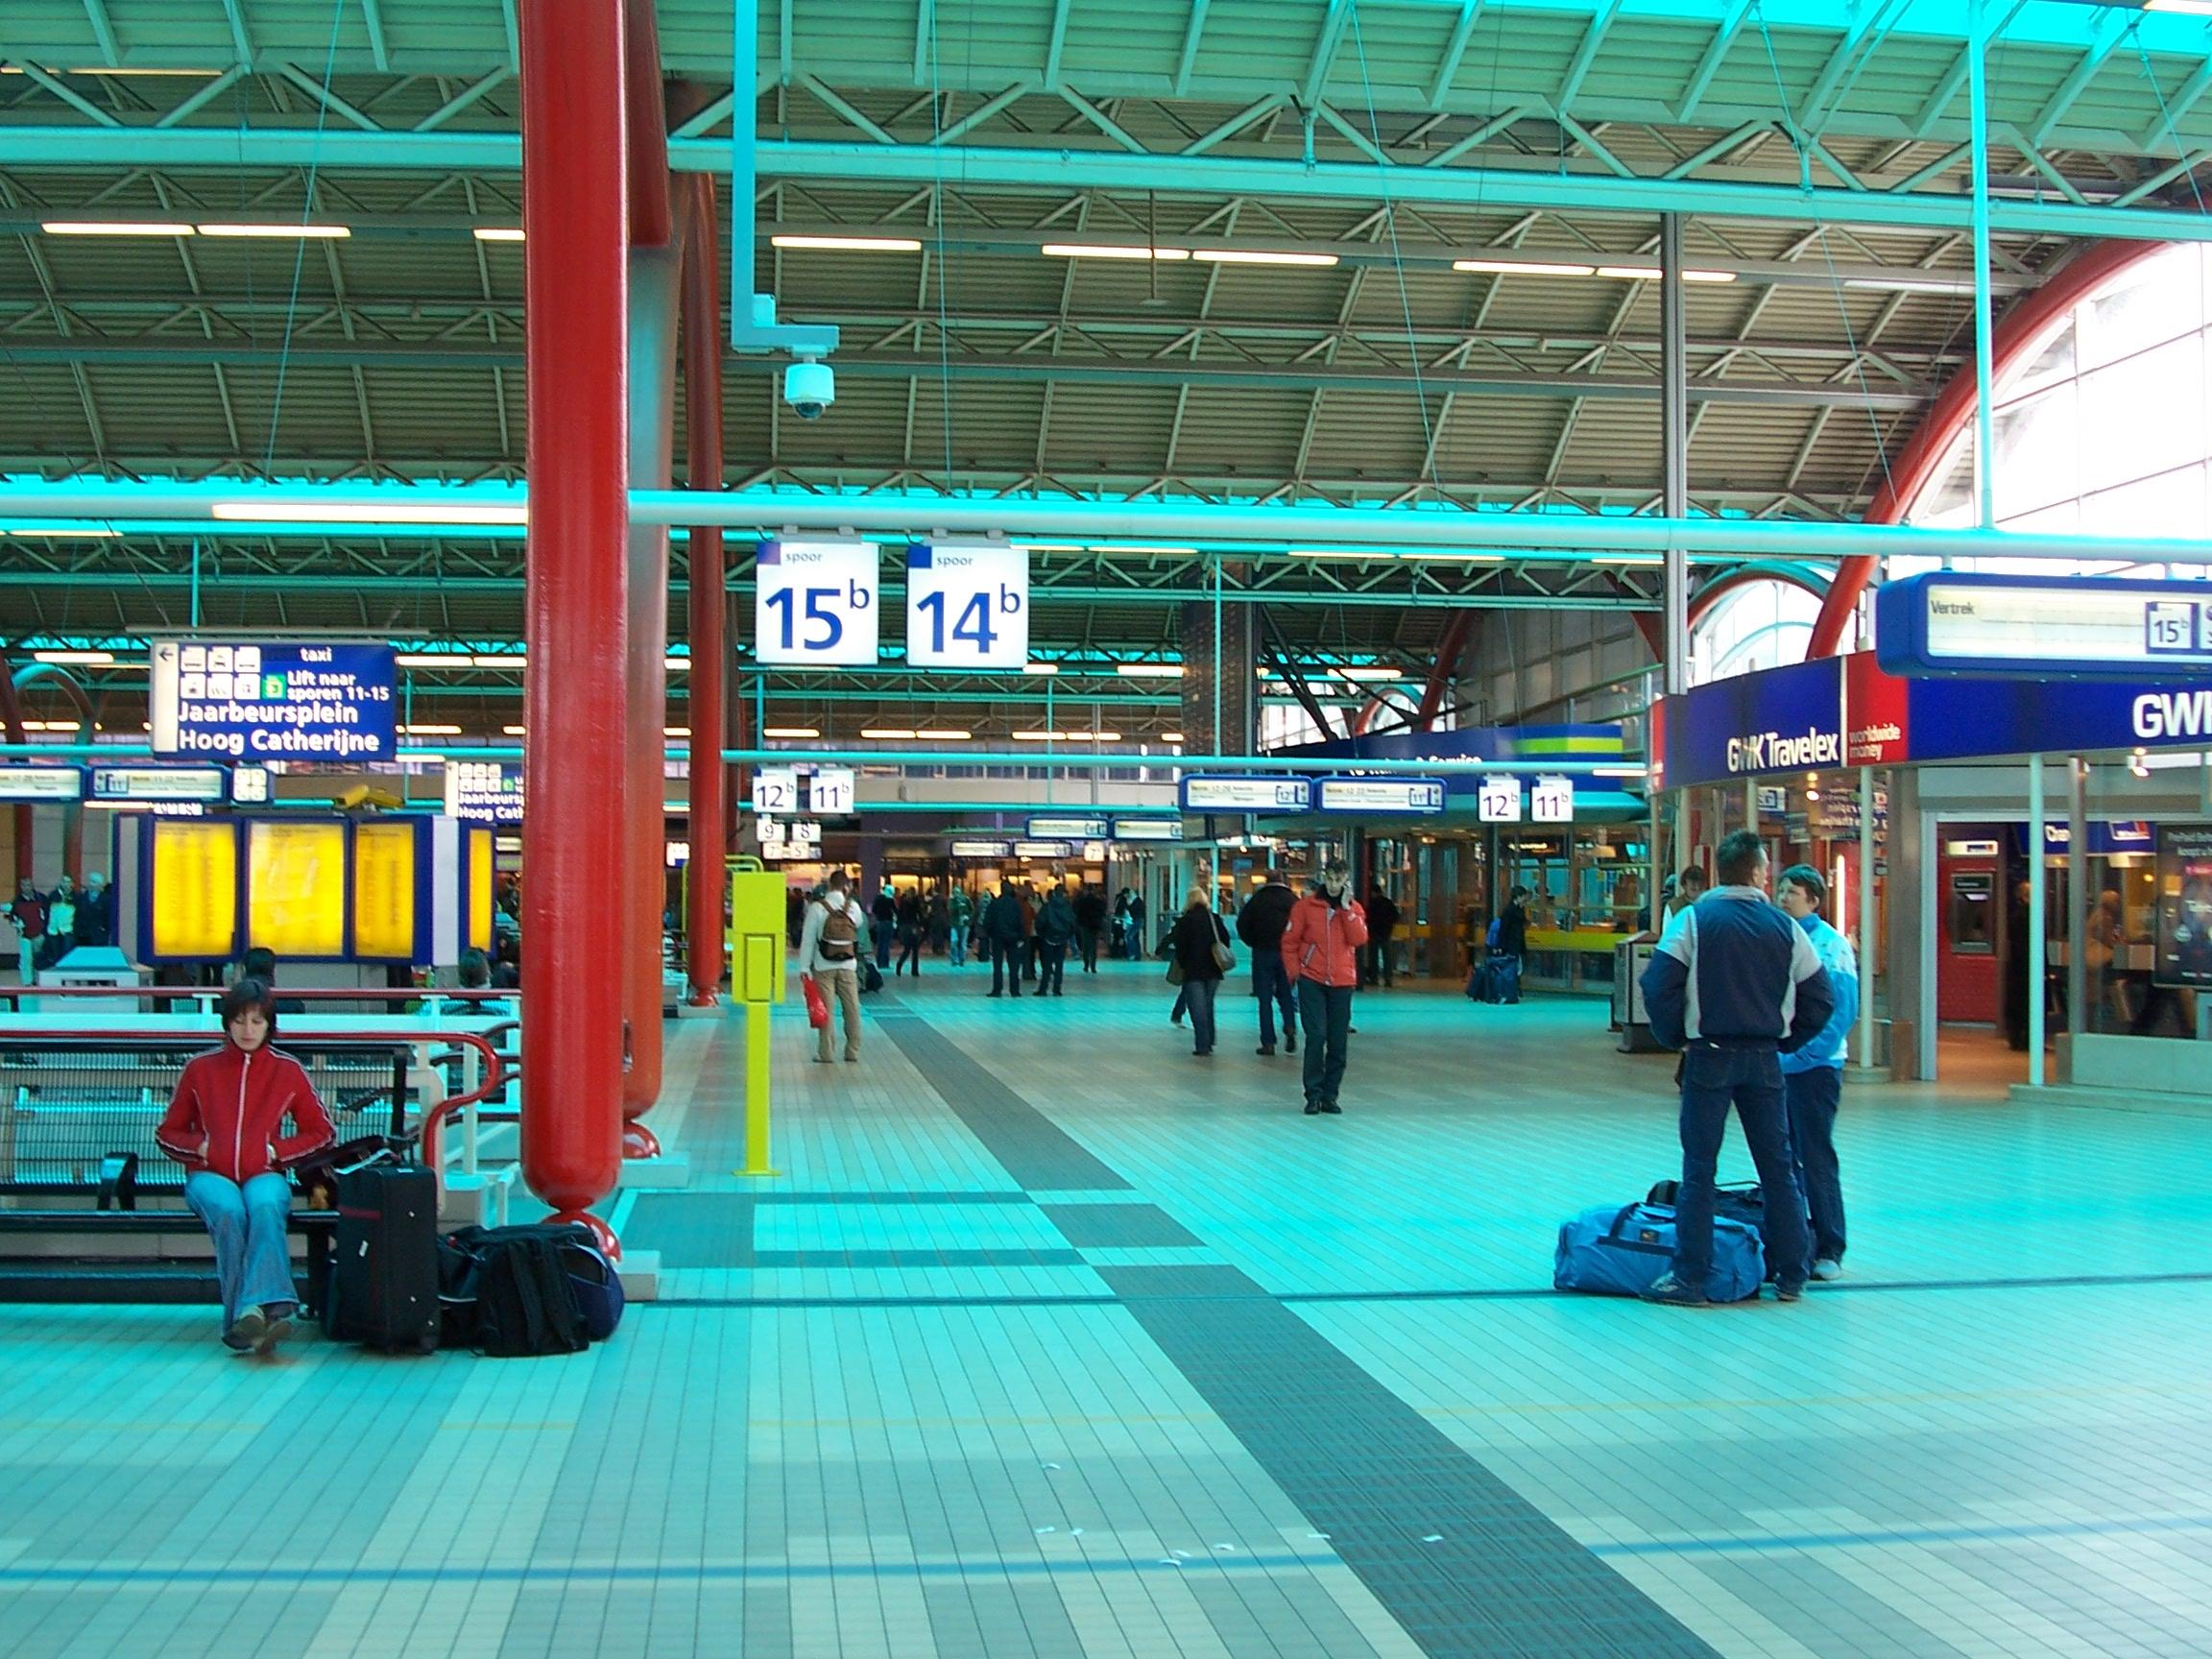 Utrecht Centraal railway station #